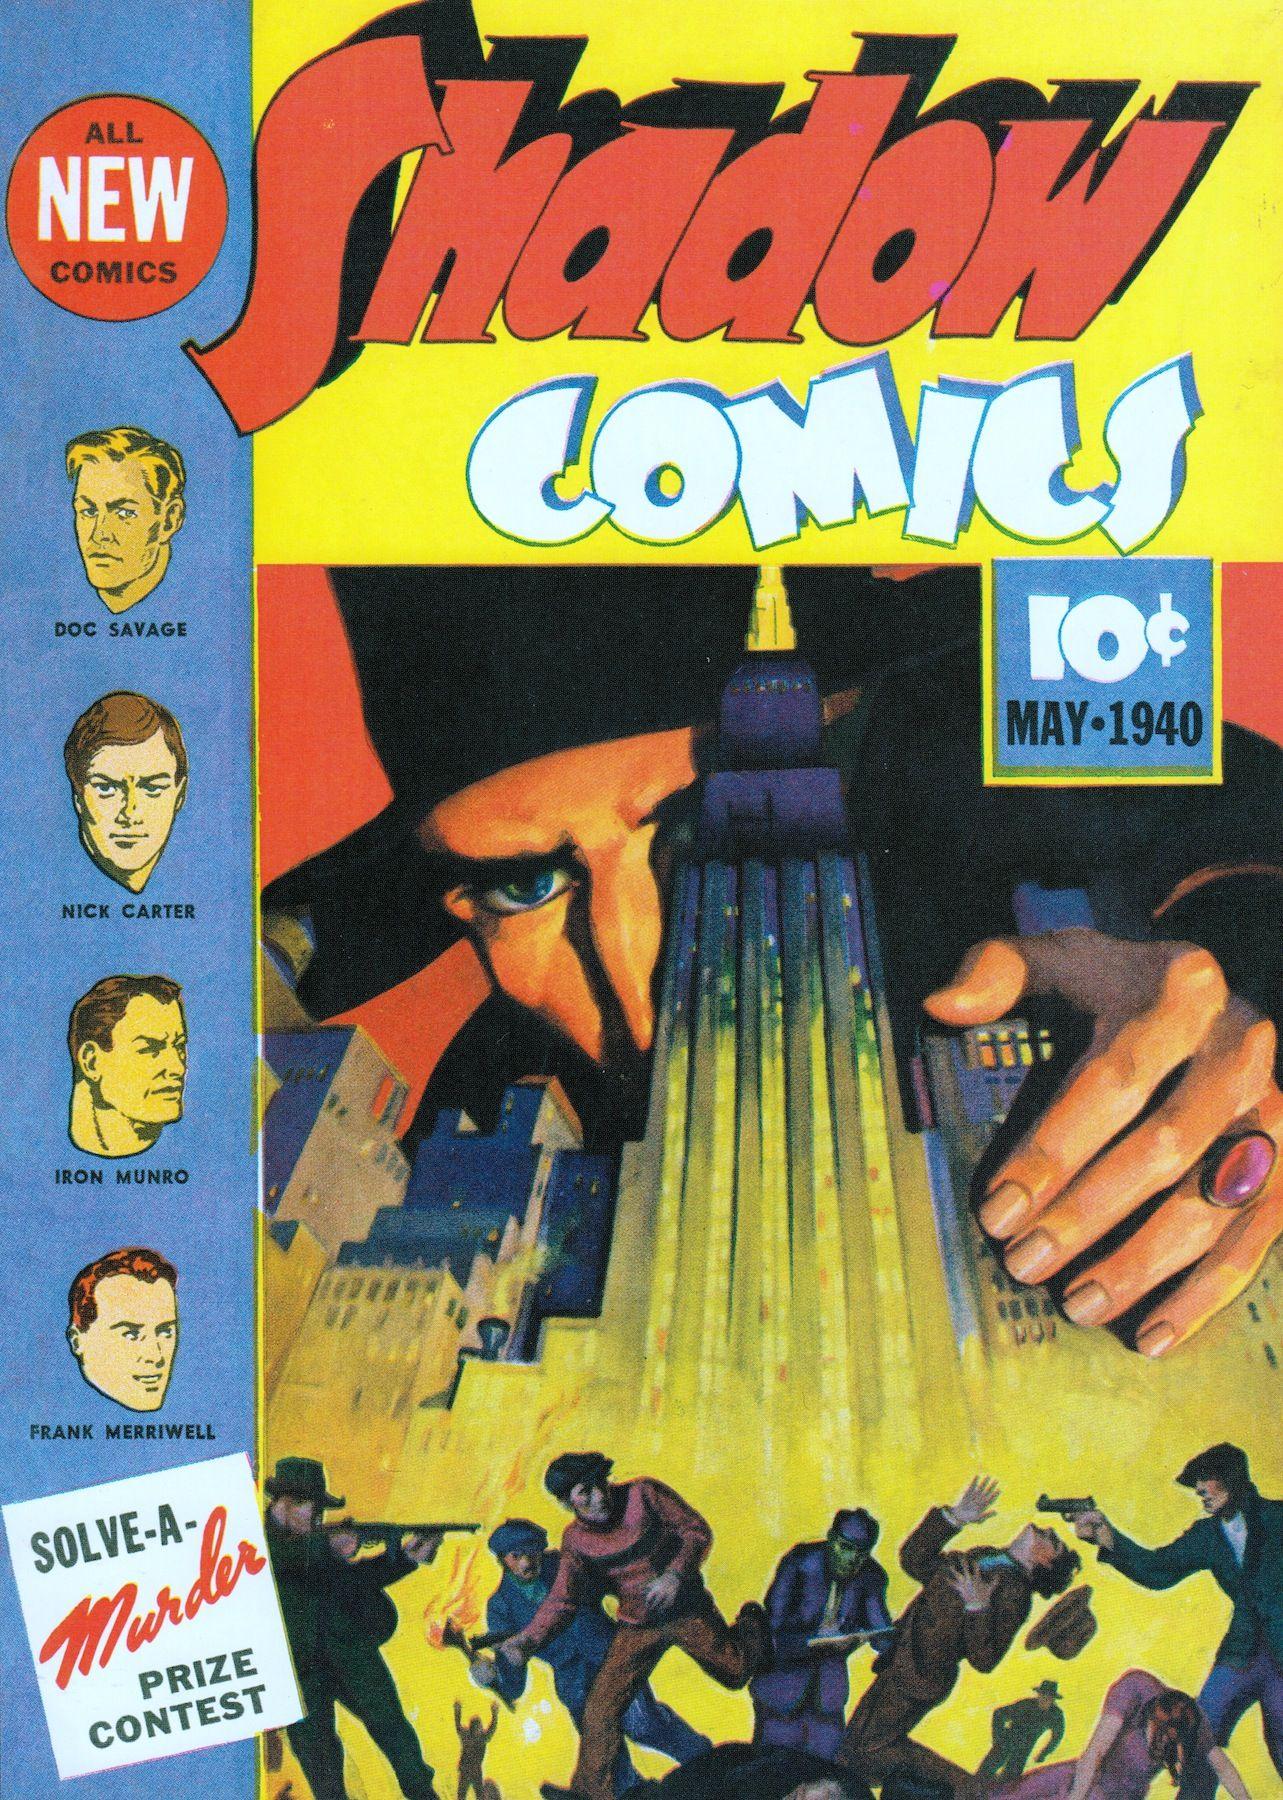 SHADOW COMICS #3 May 1940 George Rozen. (please follow minkshmink on pinterest) #shadowcomics #comics #comiccover